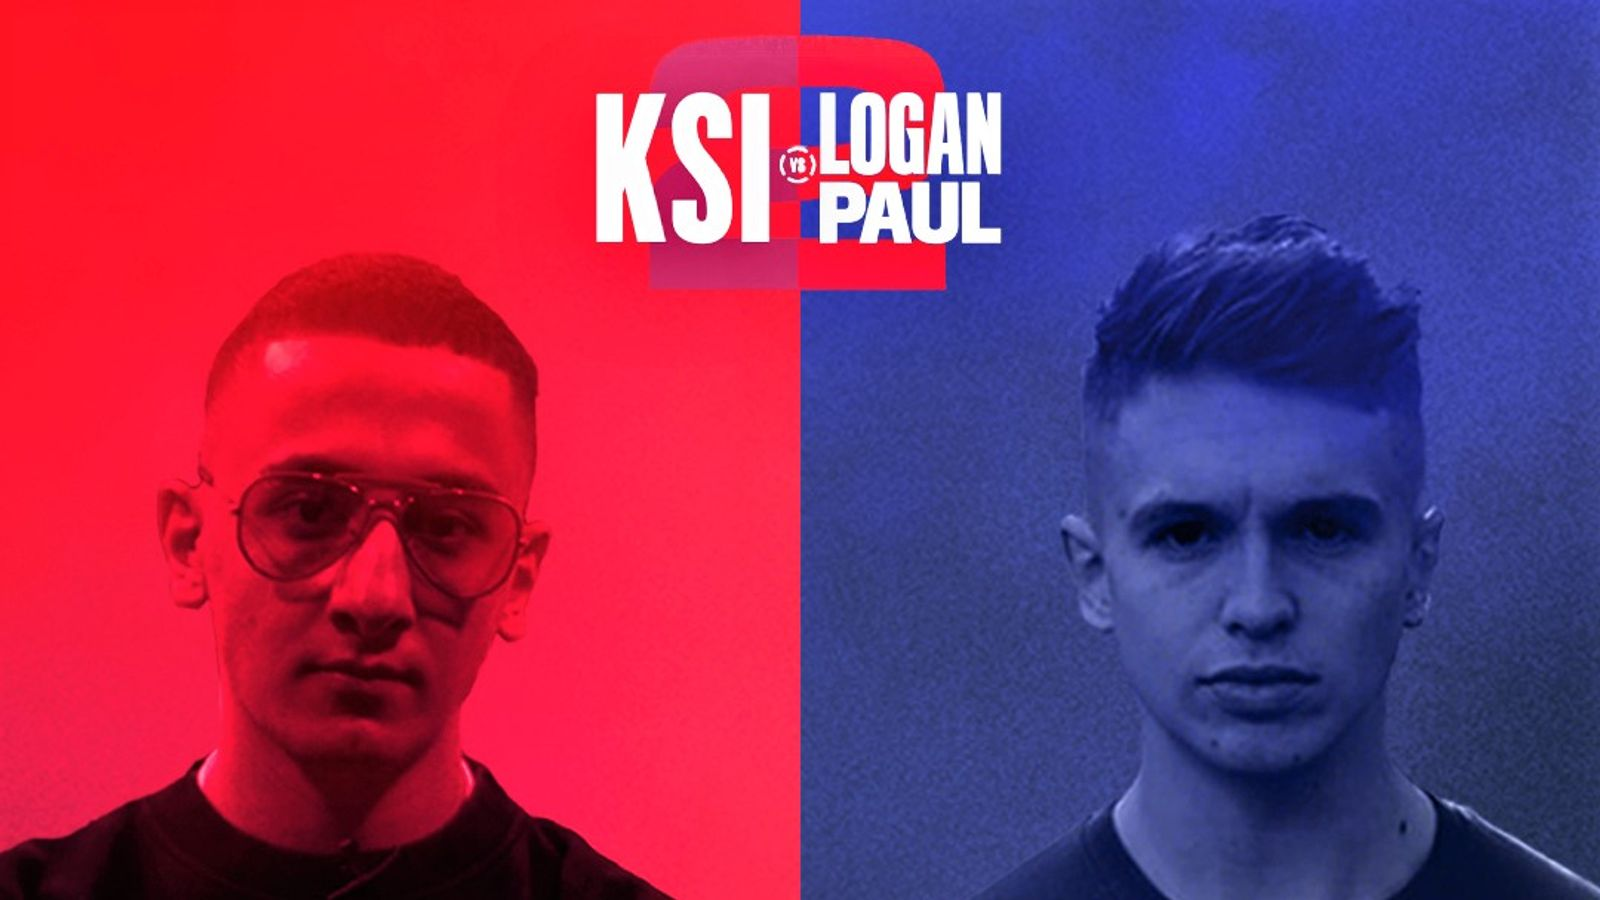 ksi vs logan paul 2 - photo #25